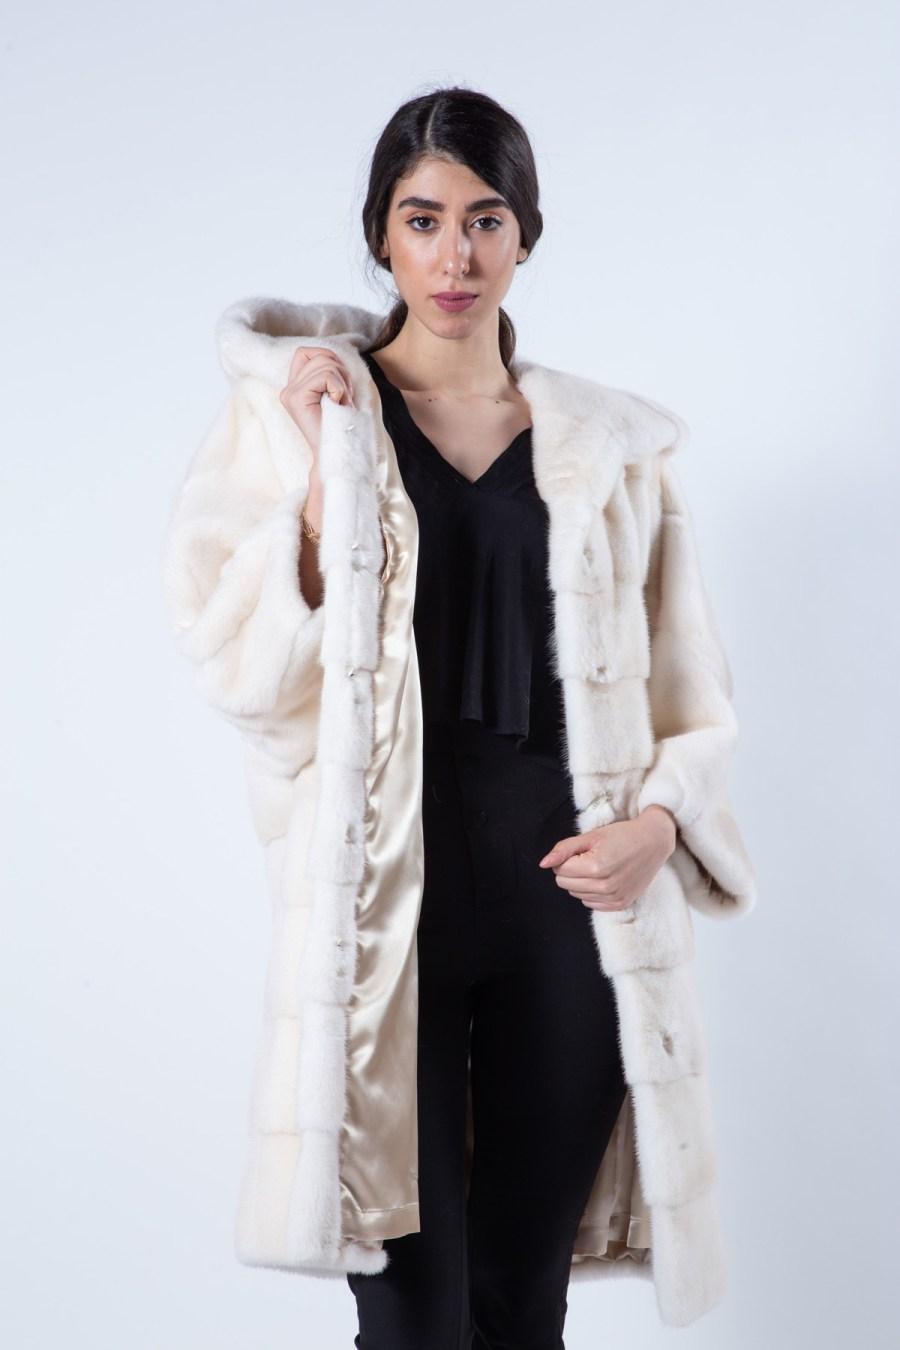 Pearl Mink Fur Jacket with hood | Пальто из меха норки цвета «жемчуг» с капюшоном - Sarigianni Furs